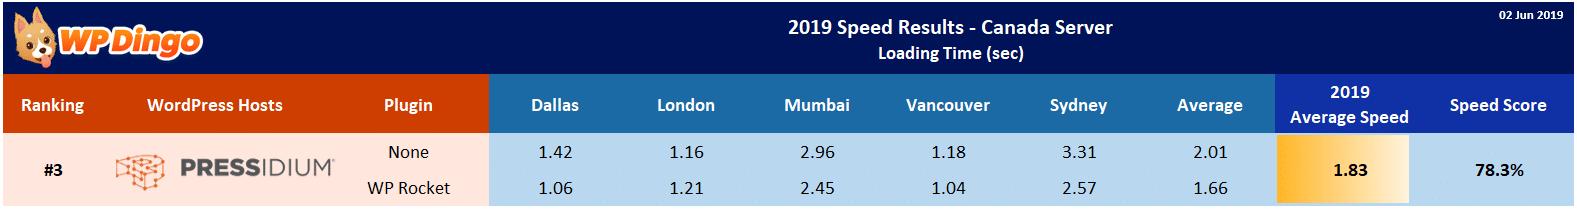 2019 Pressidium Speed Table - Canada Server